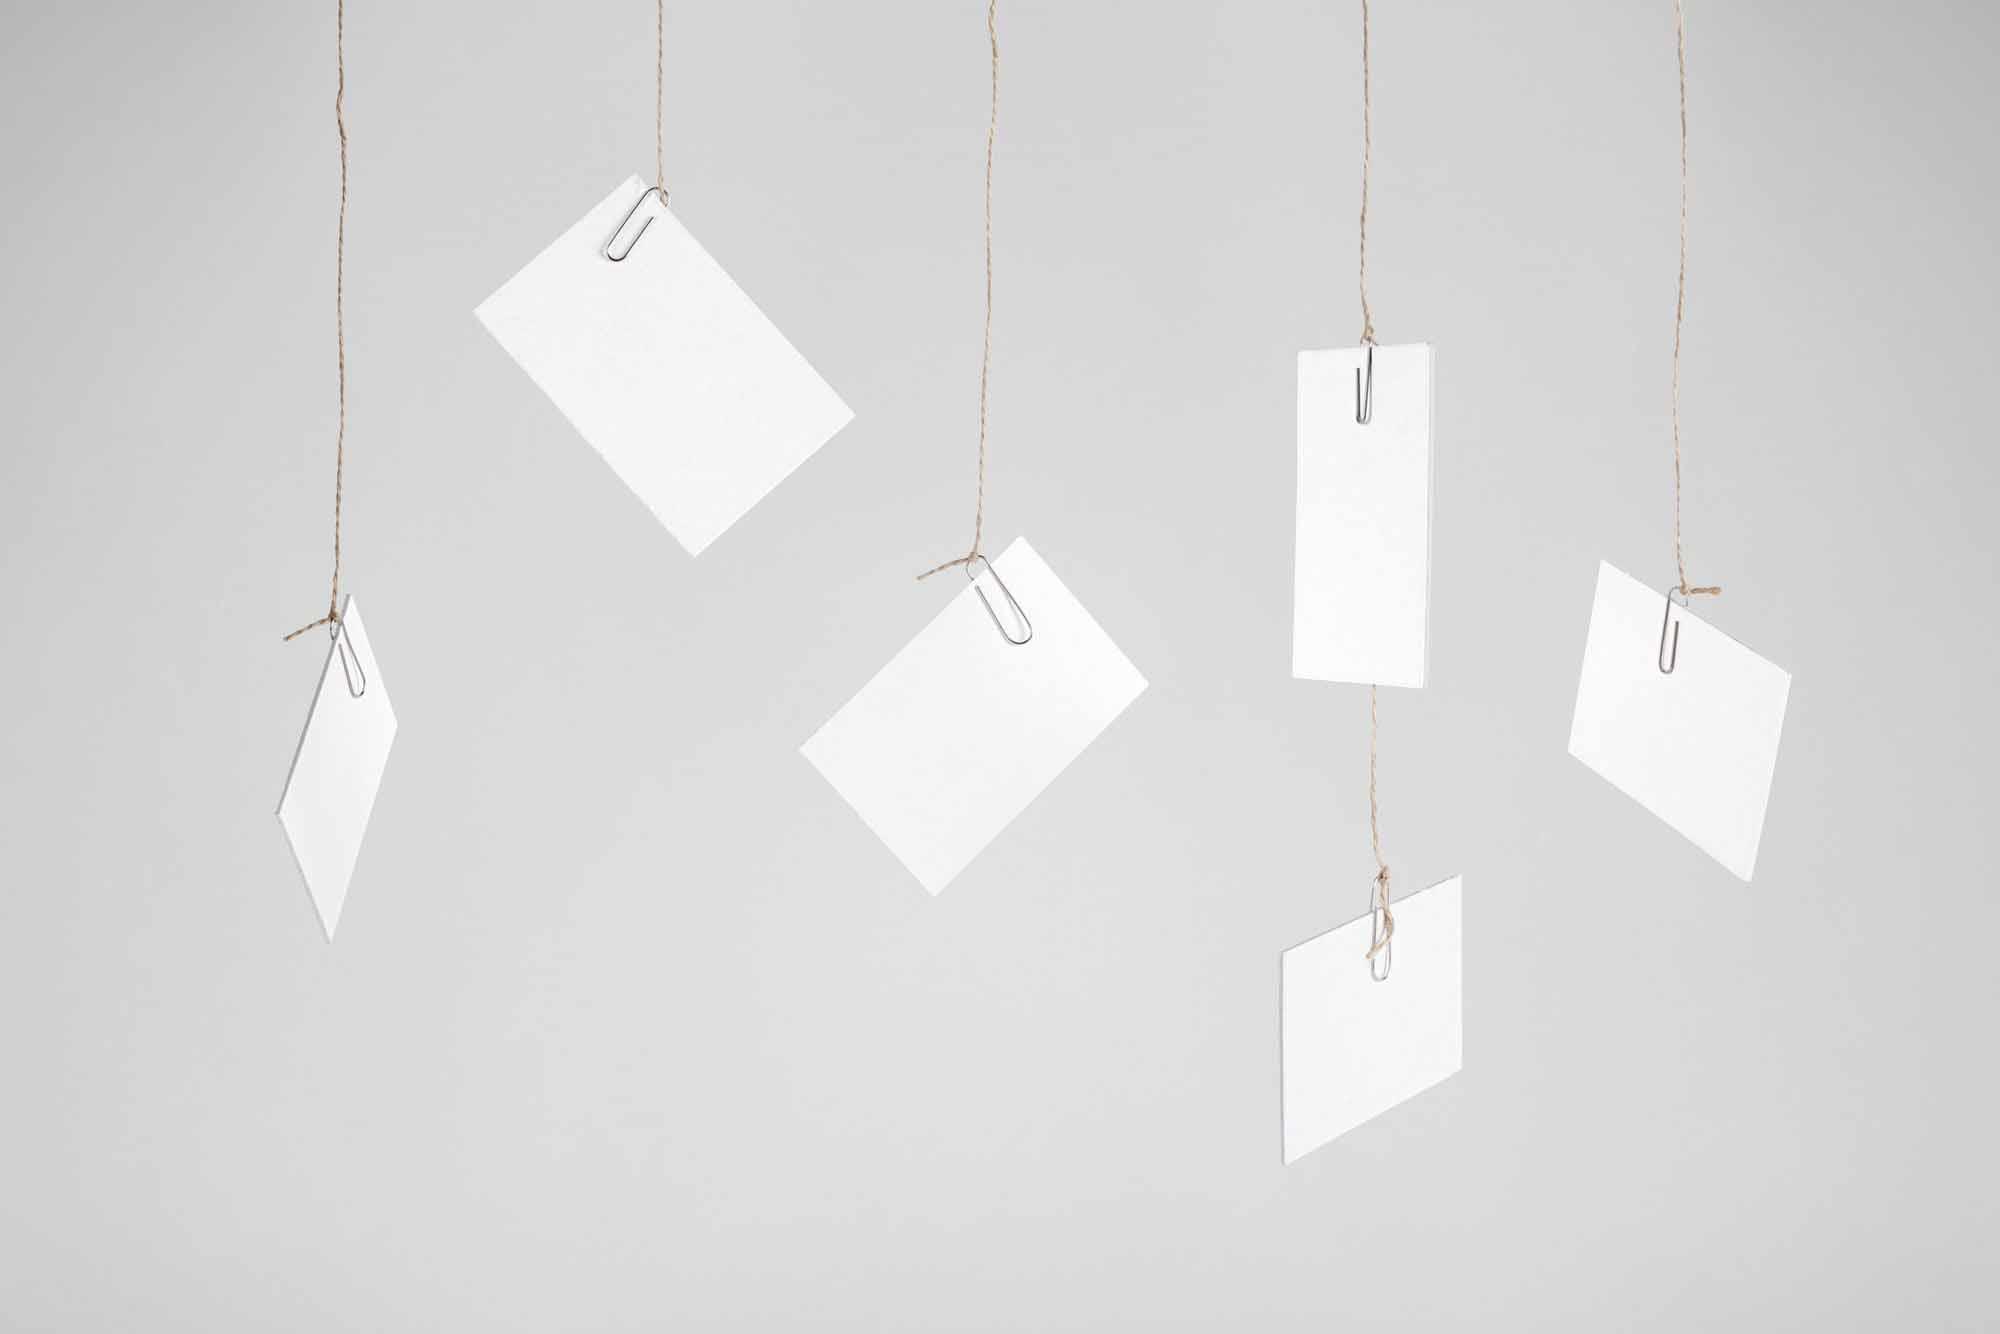 Hanging Business Cards Mockup 2